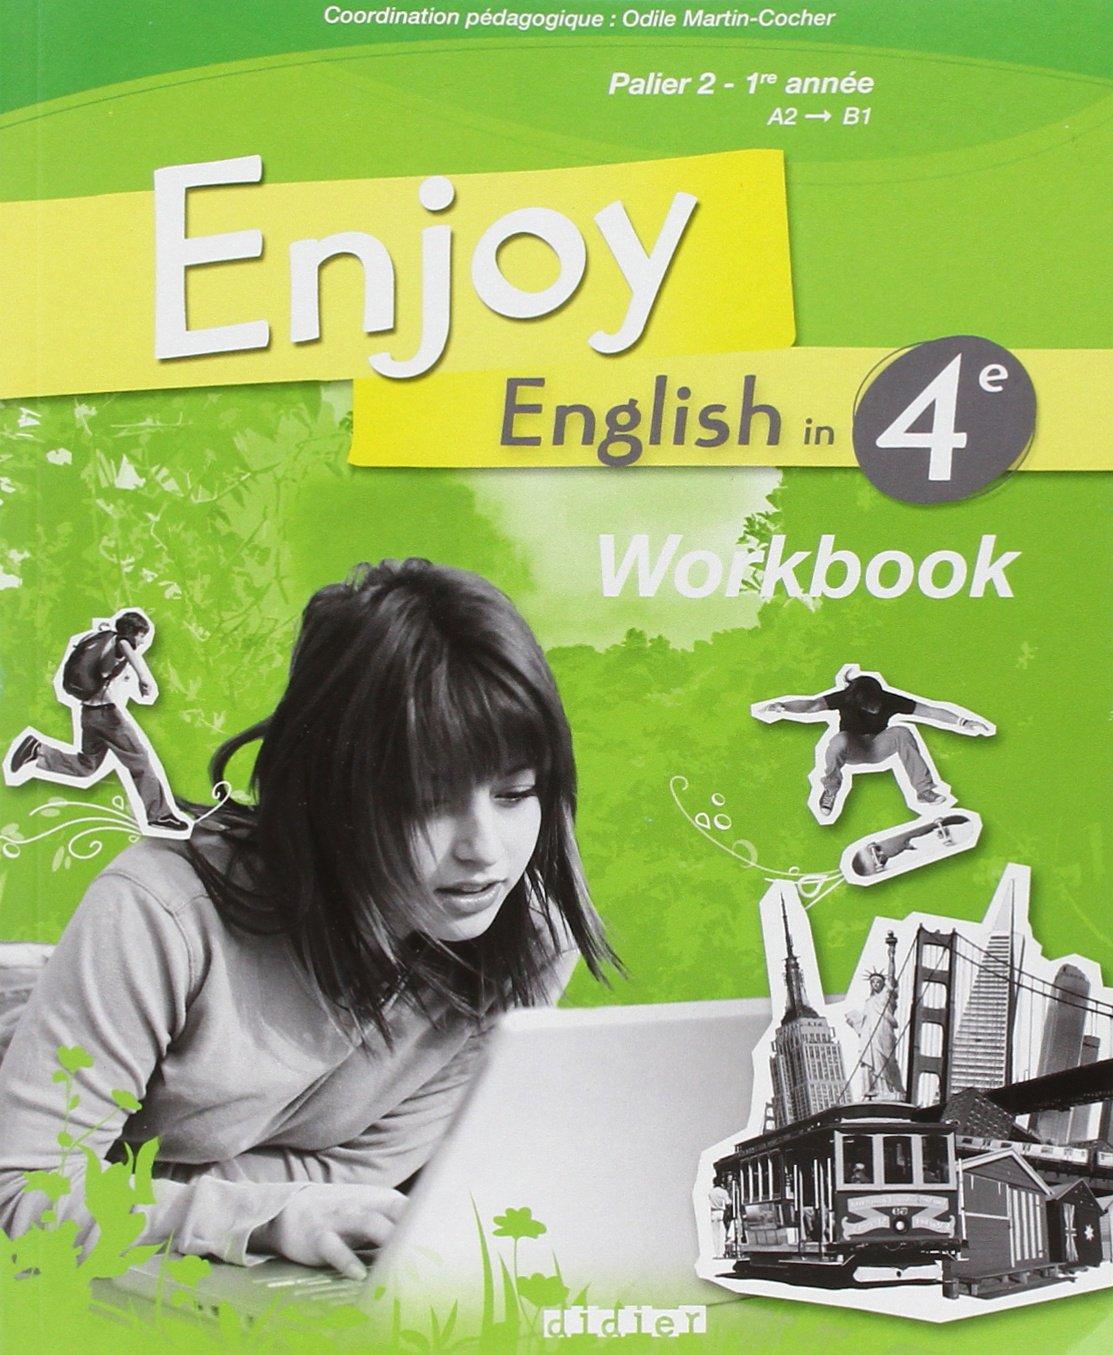 reponse workbook 4eme